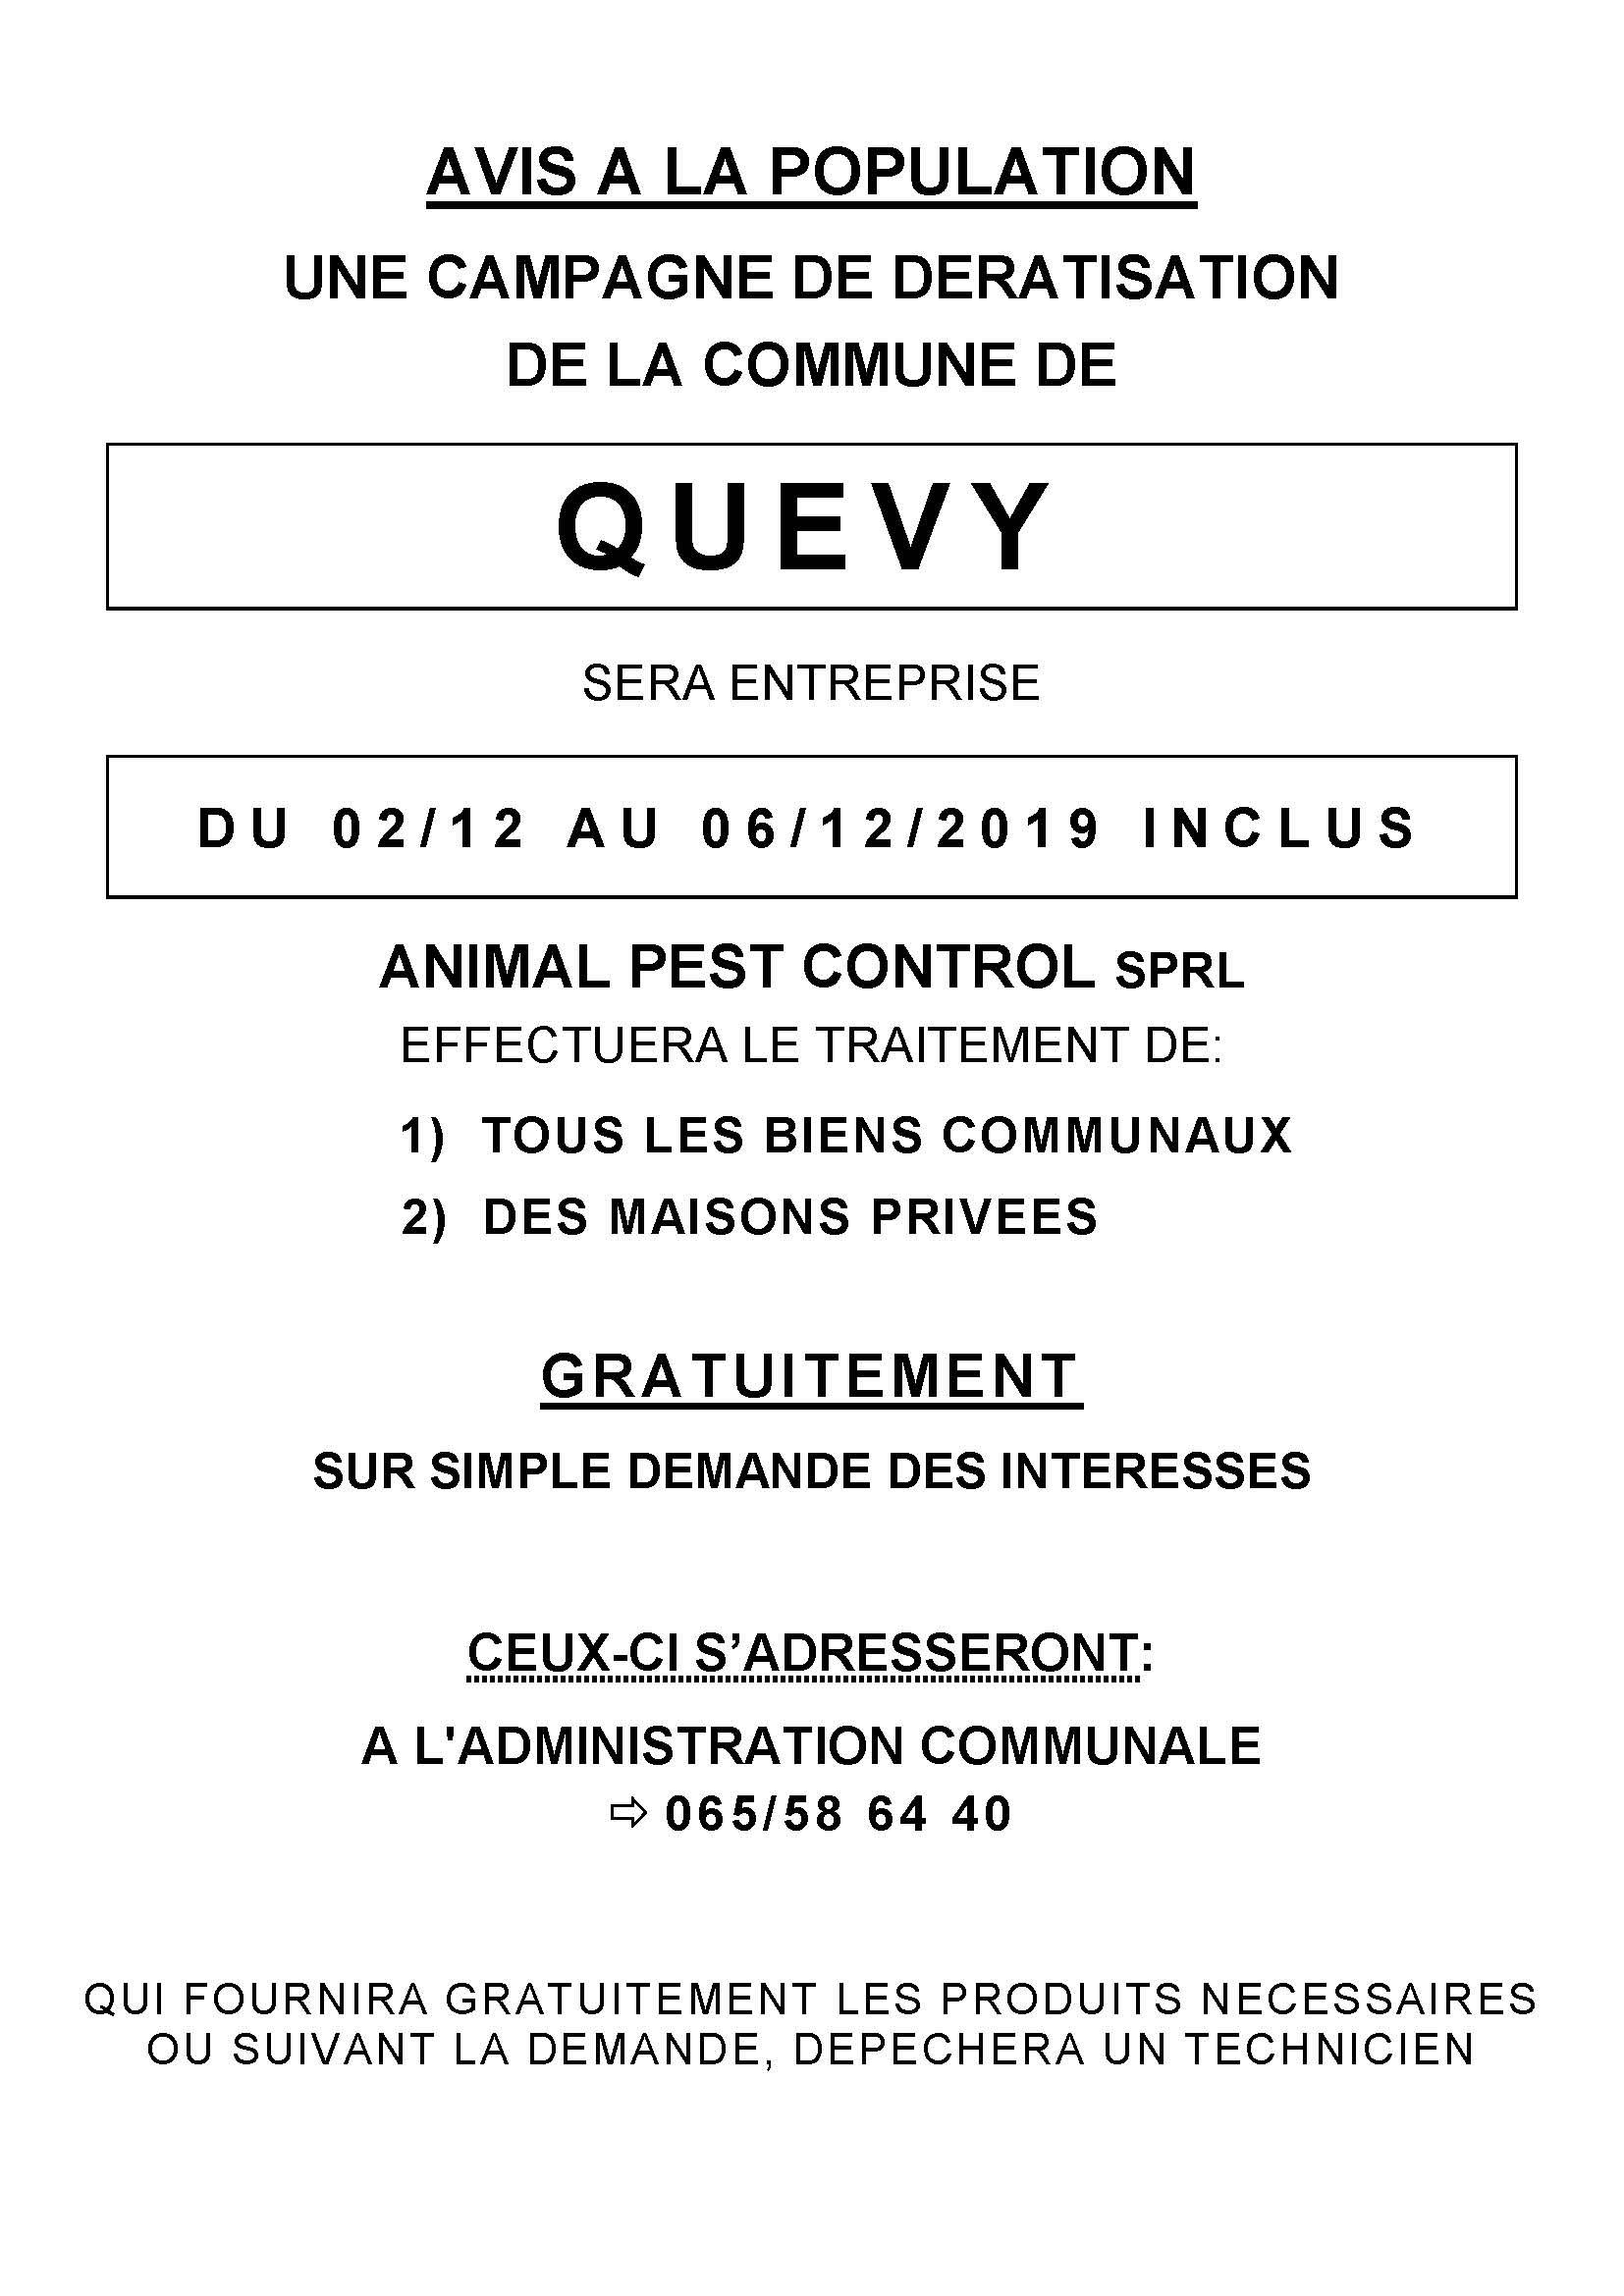 quévy - dératisation - affiche automne 2019.jpg